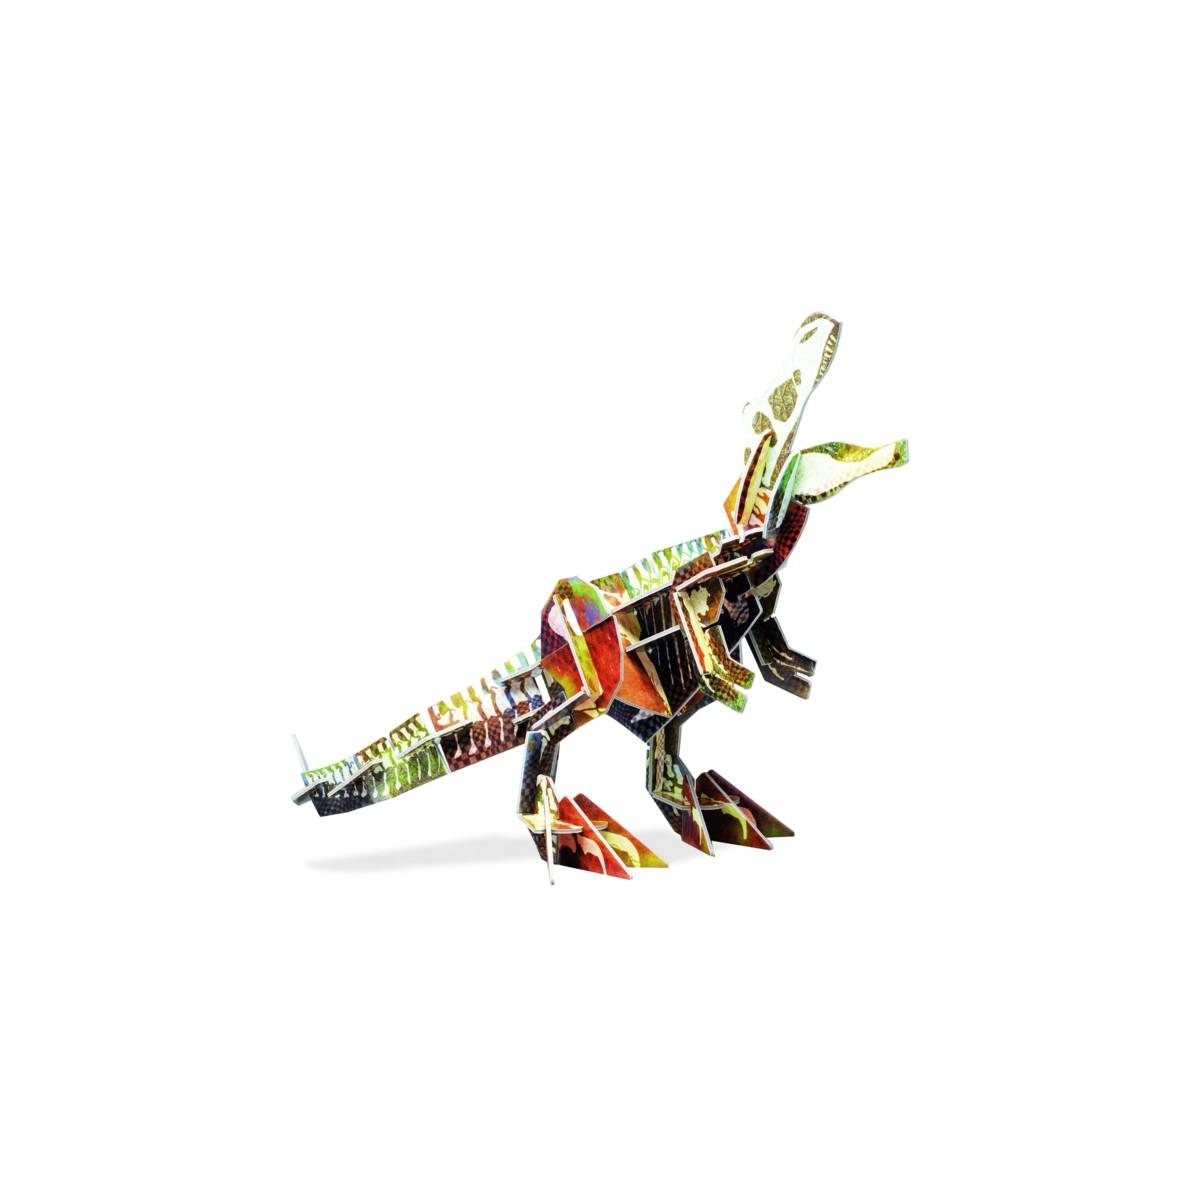 Ecokit jeu de construction en 3d tyrannosaurus for Jeux de construction de maison en 3d